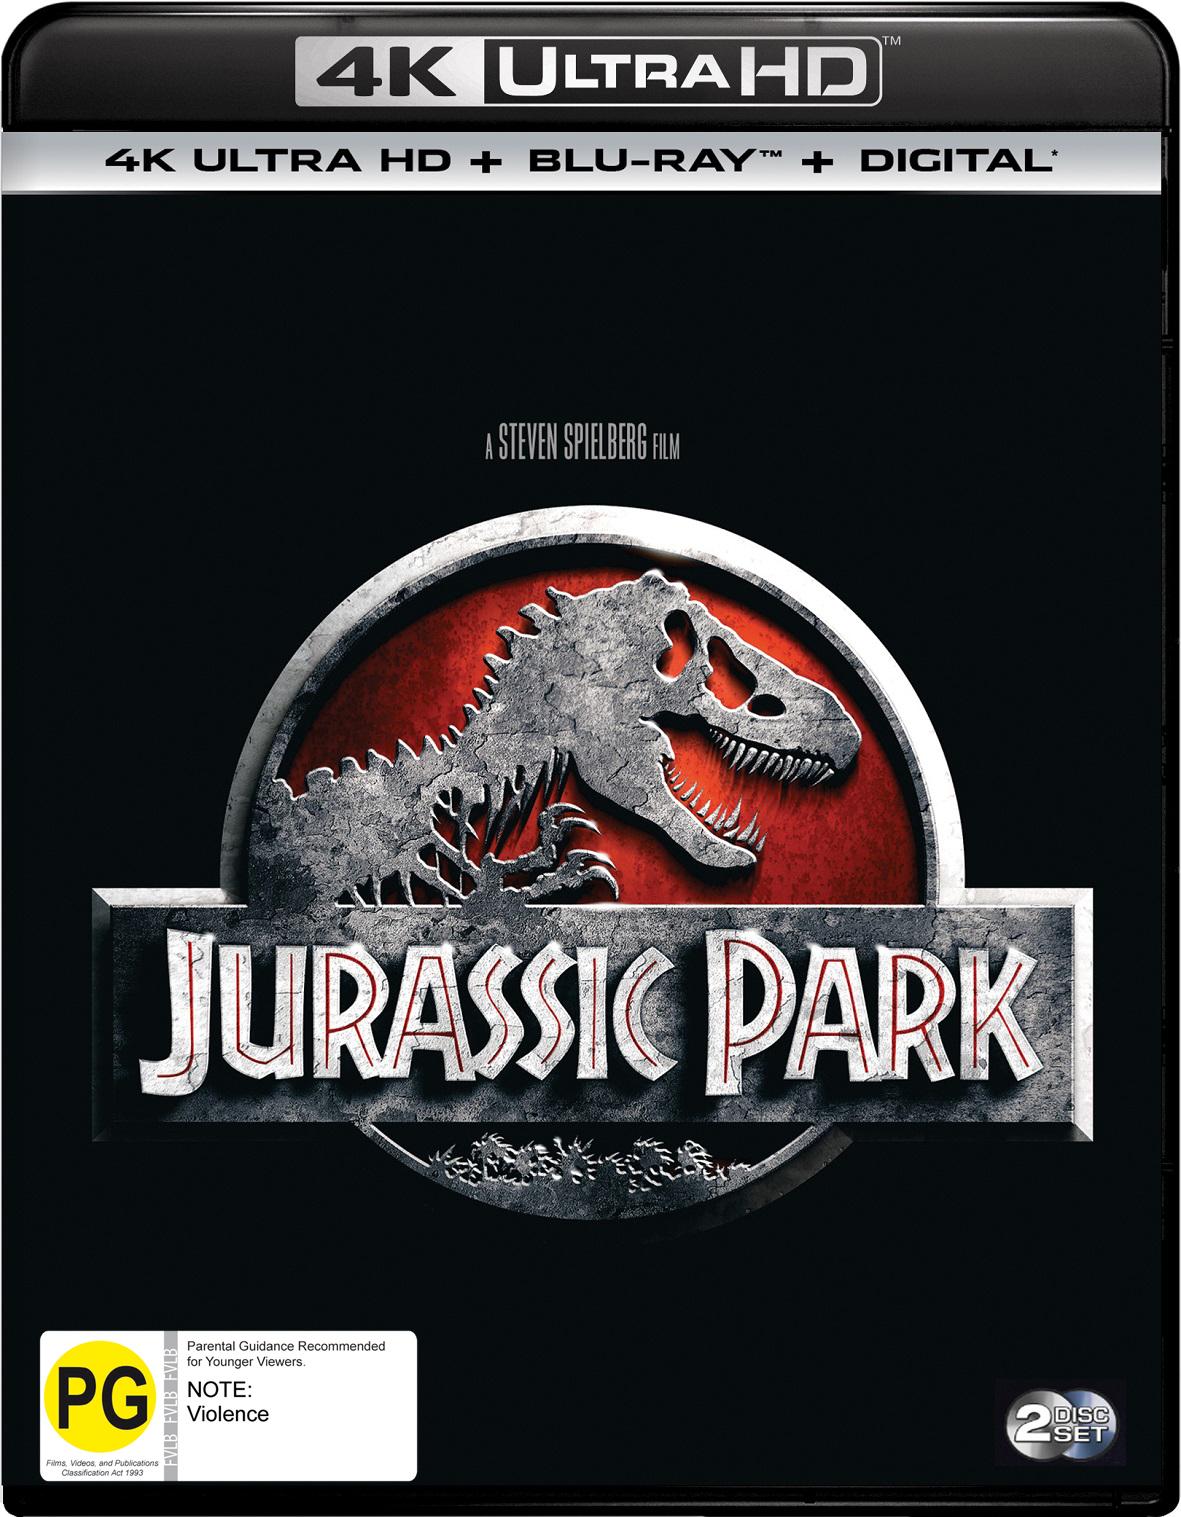 Jurassic Park on UHD Blu-ray image